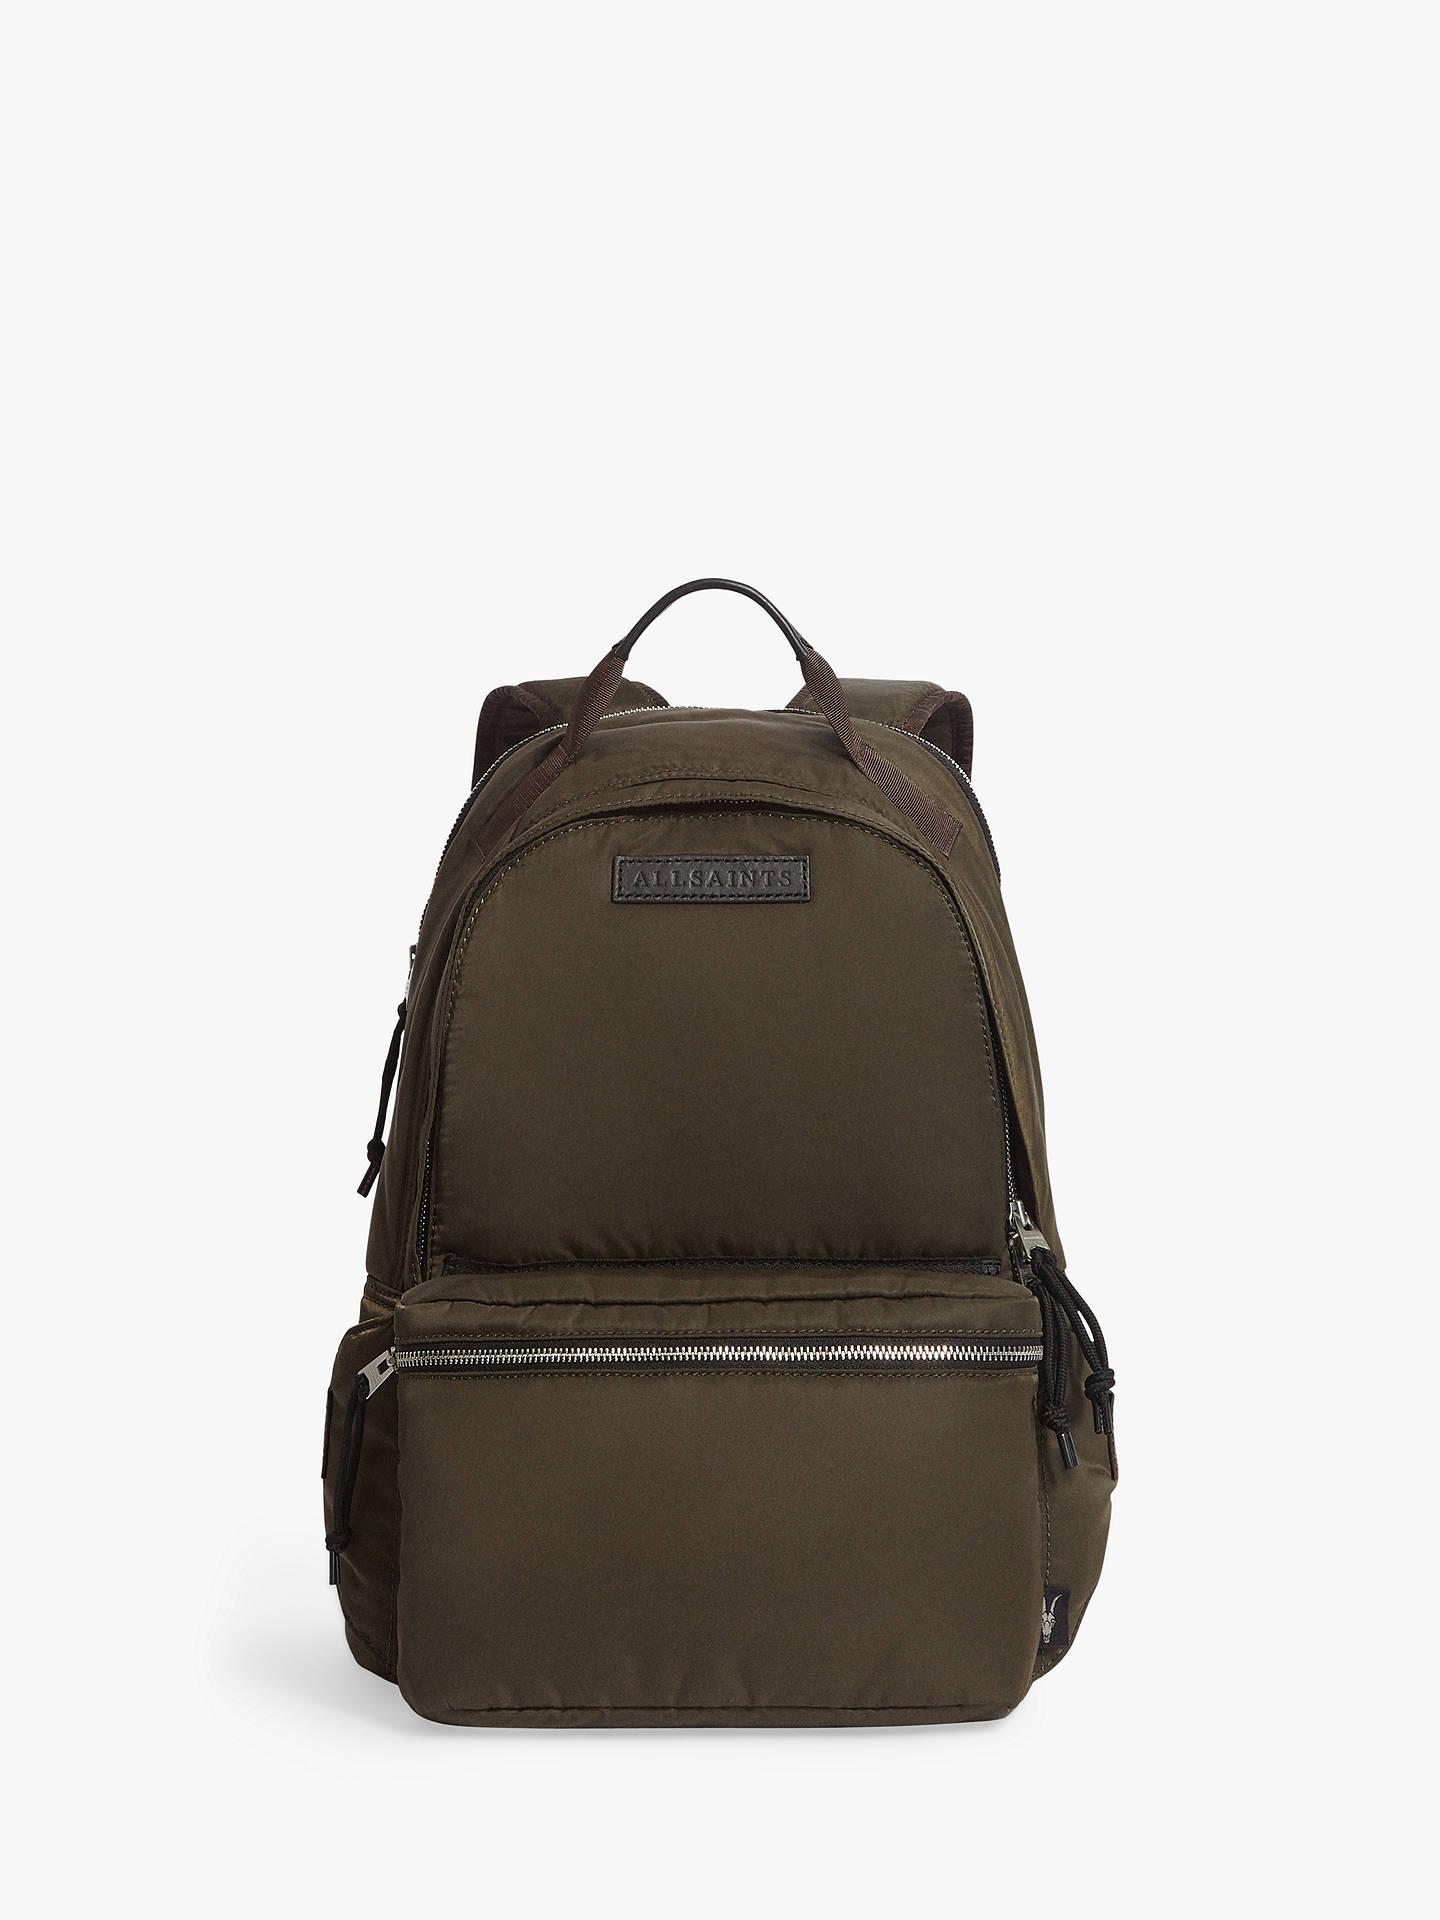 989a692c49b7 AllSaints Kansai 2 in 1 Backpack at John Lewis   Partners